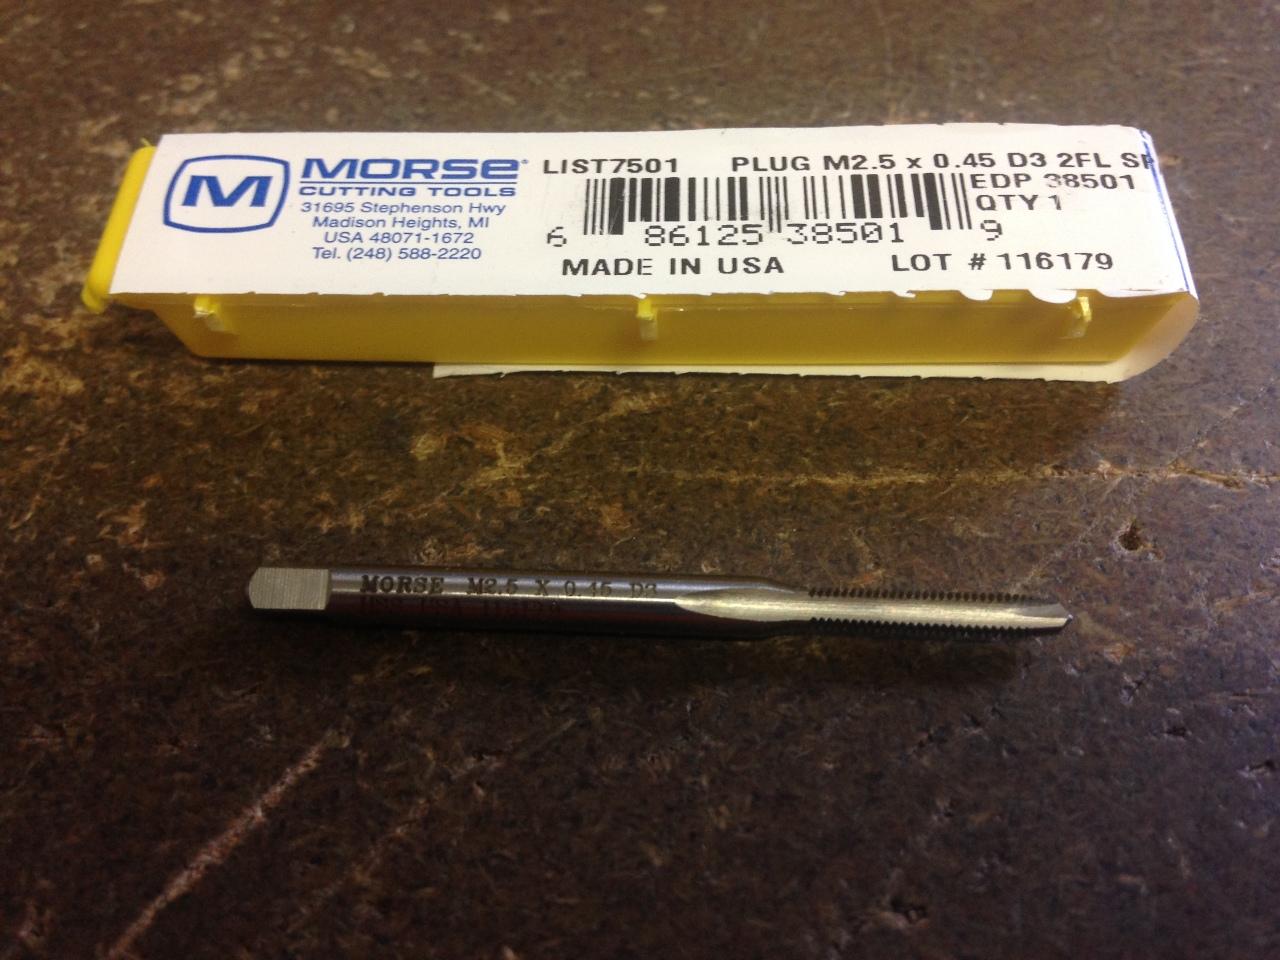 NEW USA M2.5 x 0.45 HSS Chrome Spiral Point Plug Tap D3 2FL .45mm Pitch